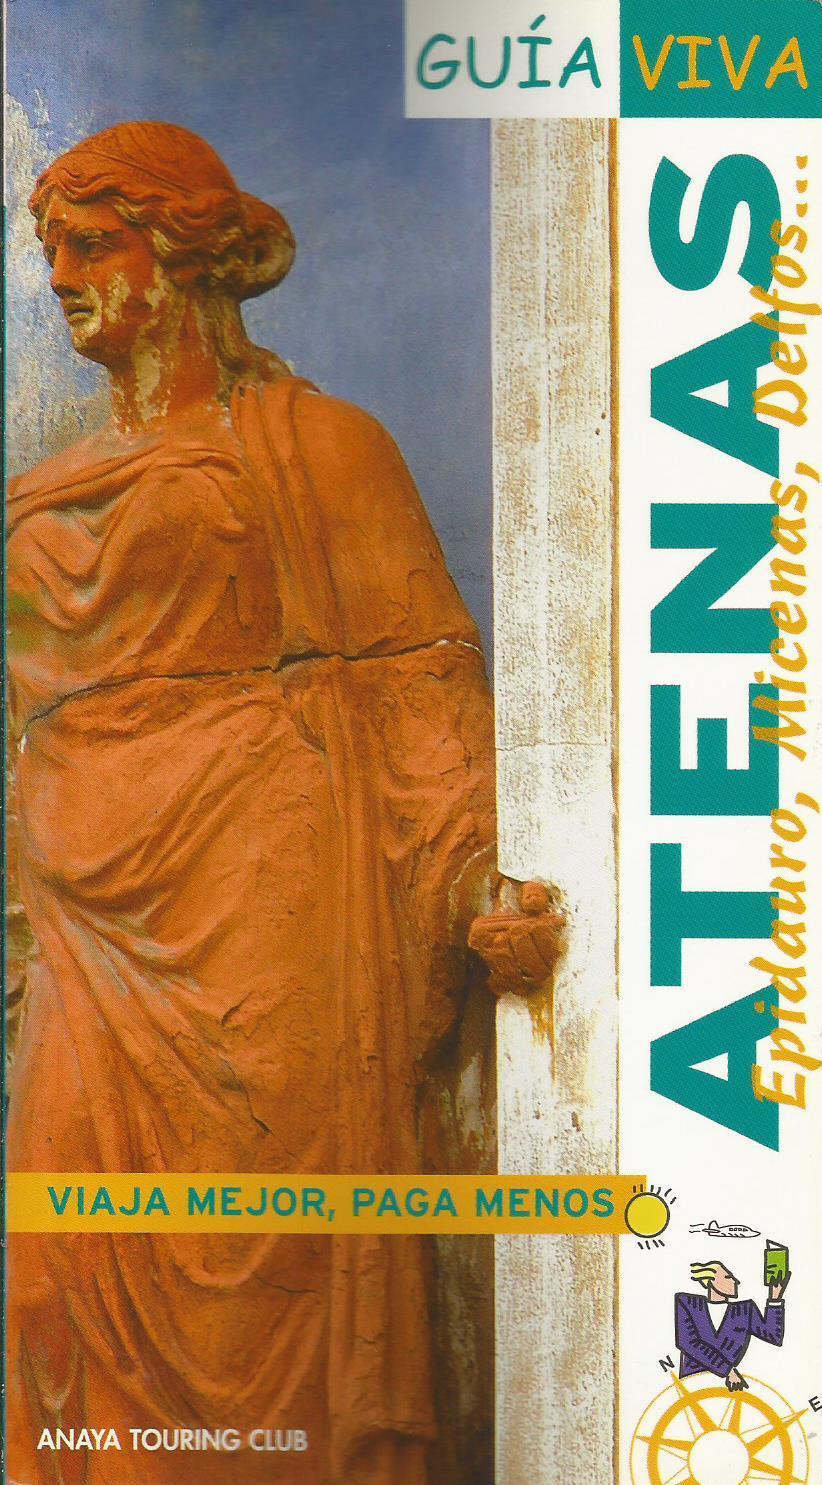 Atenas: Guía Viva - Ana Isabel Ron